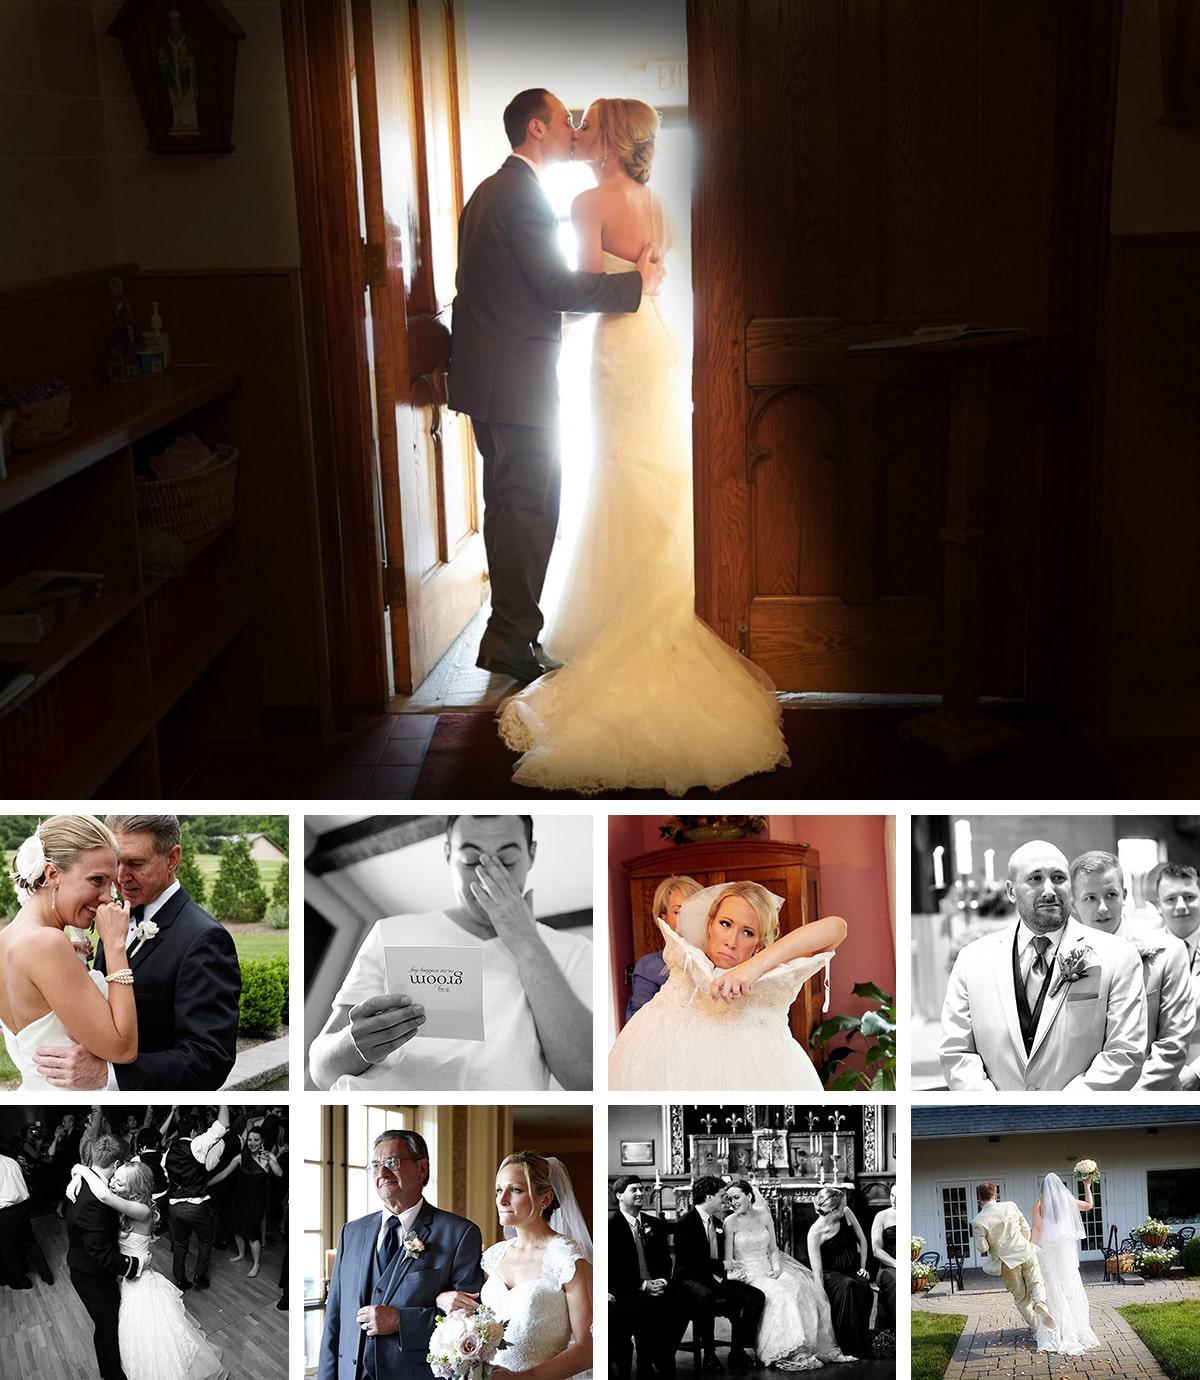 emotional wedding day moment photos